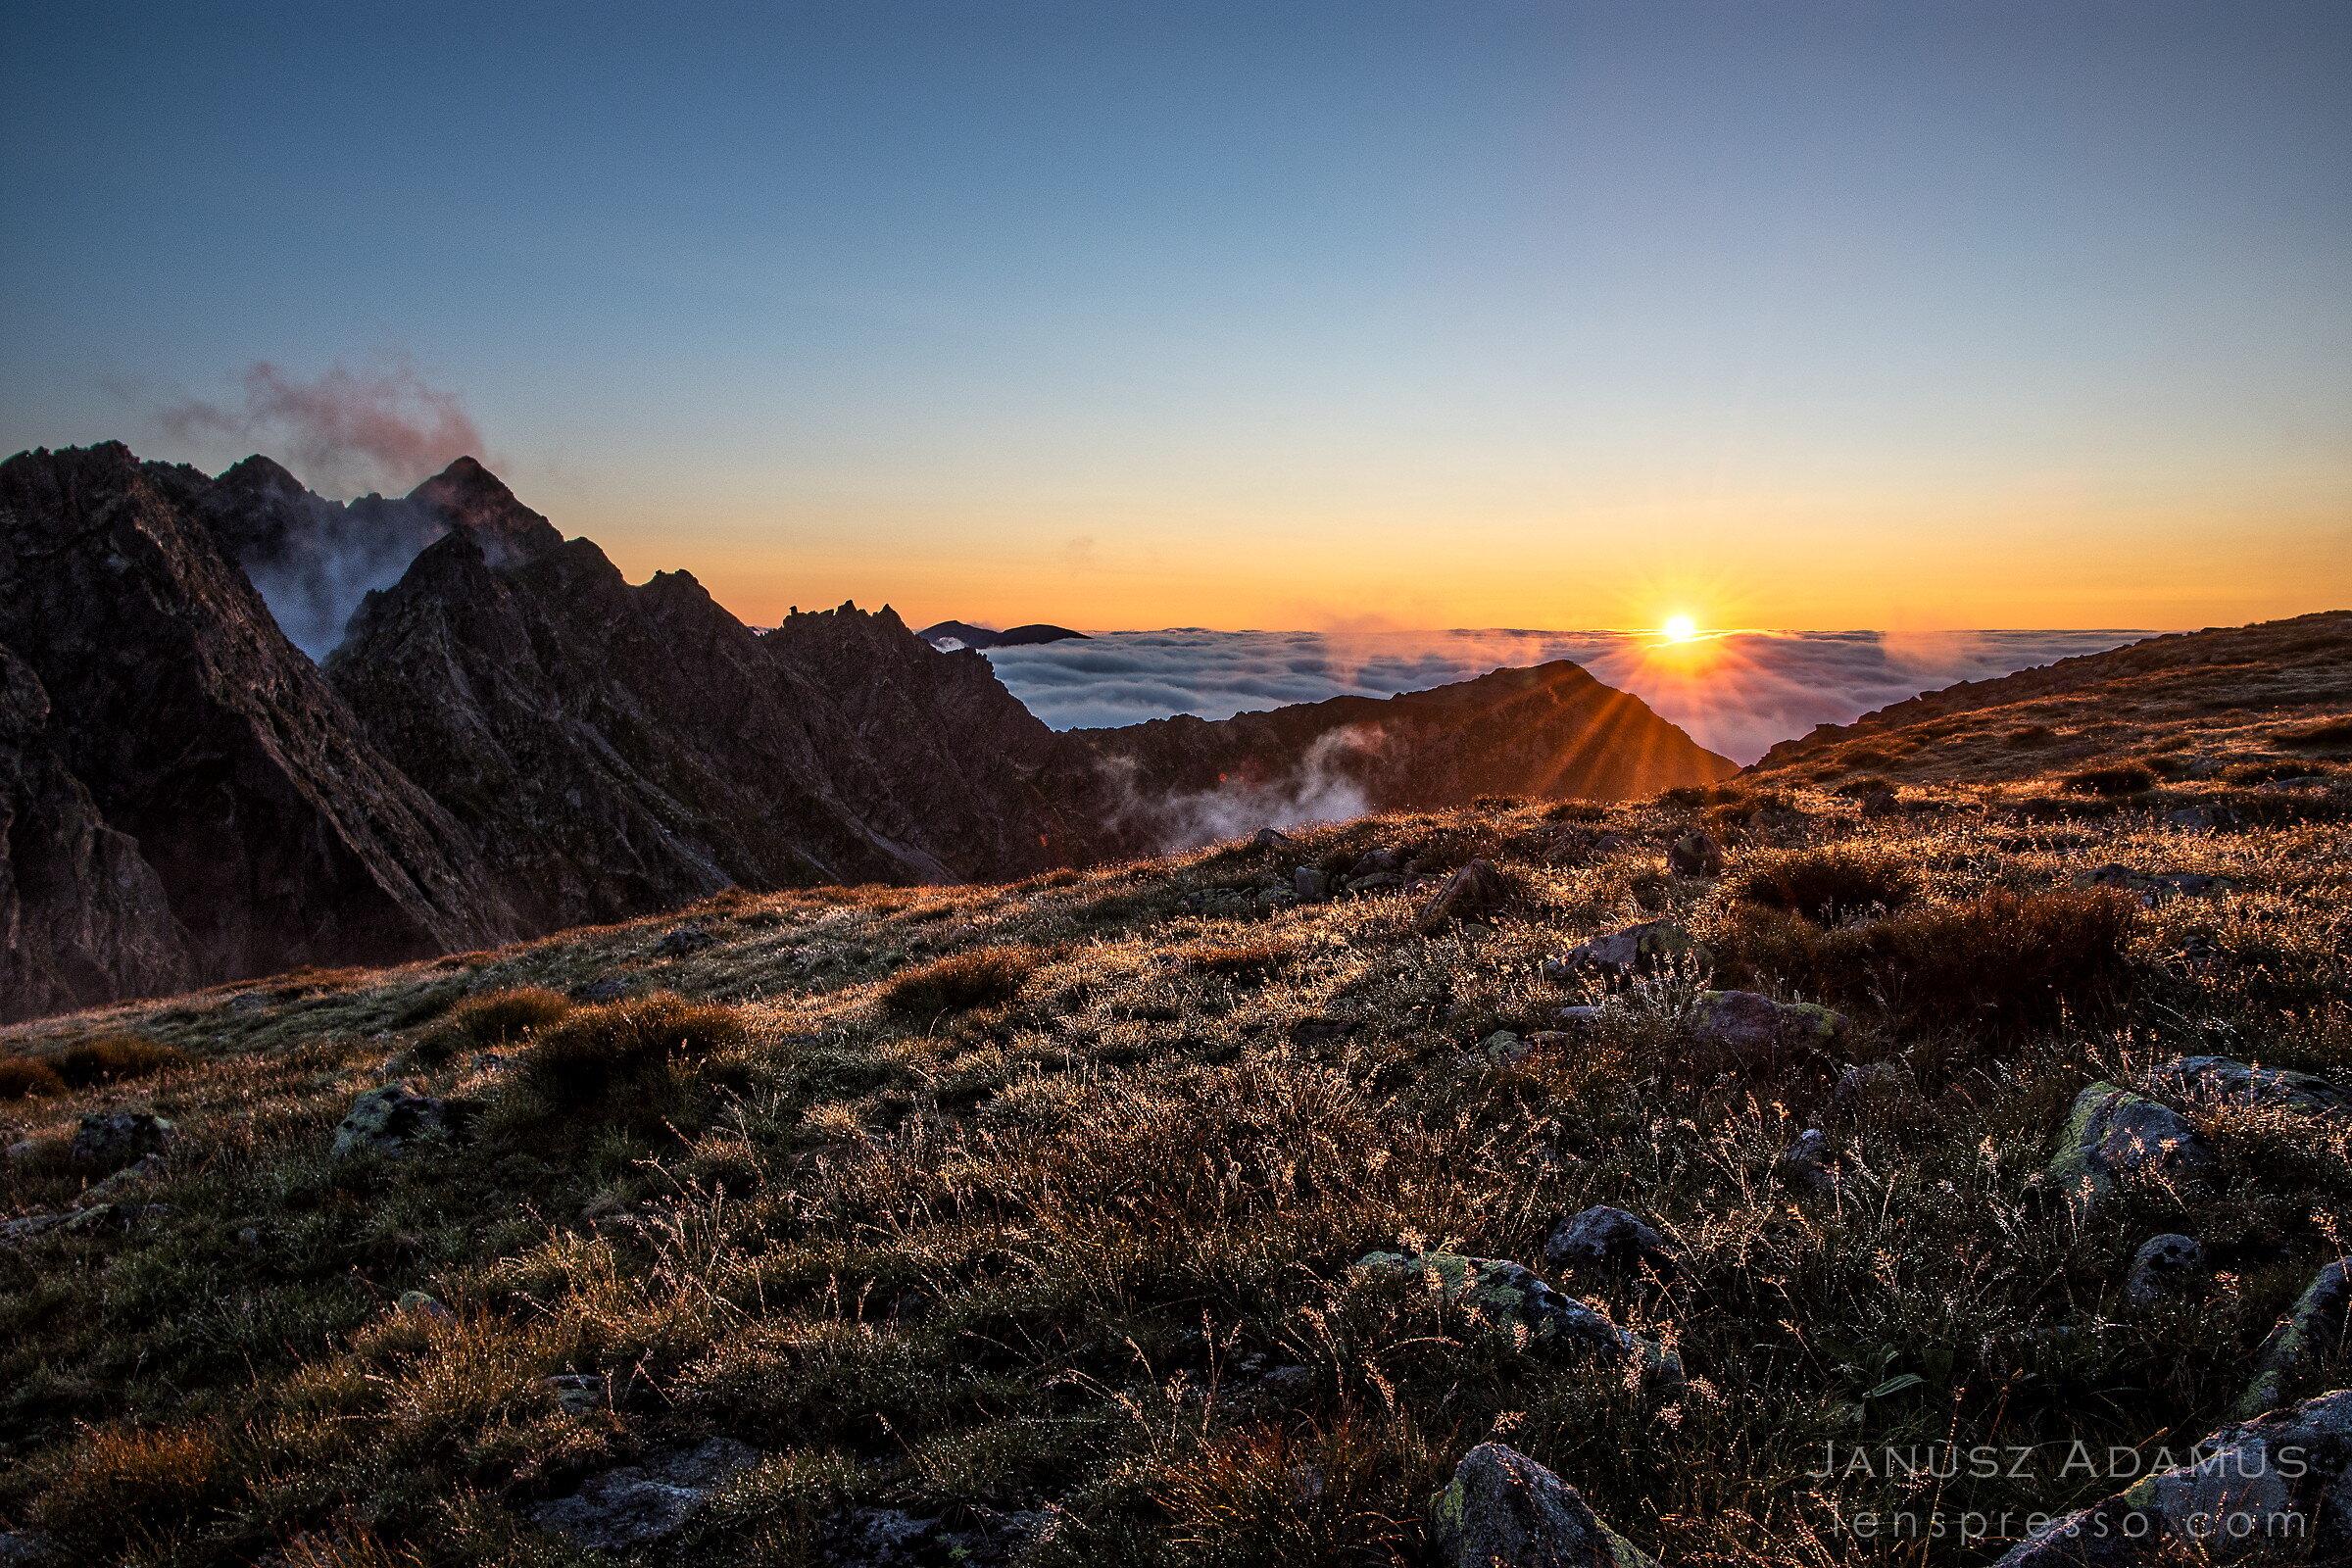 Sunset at Krzyzne